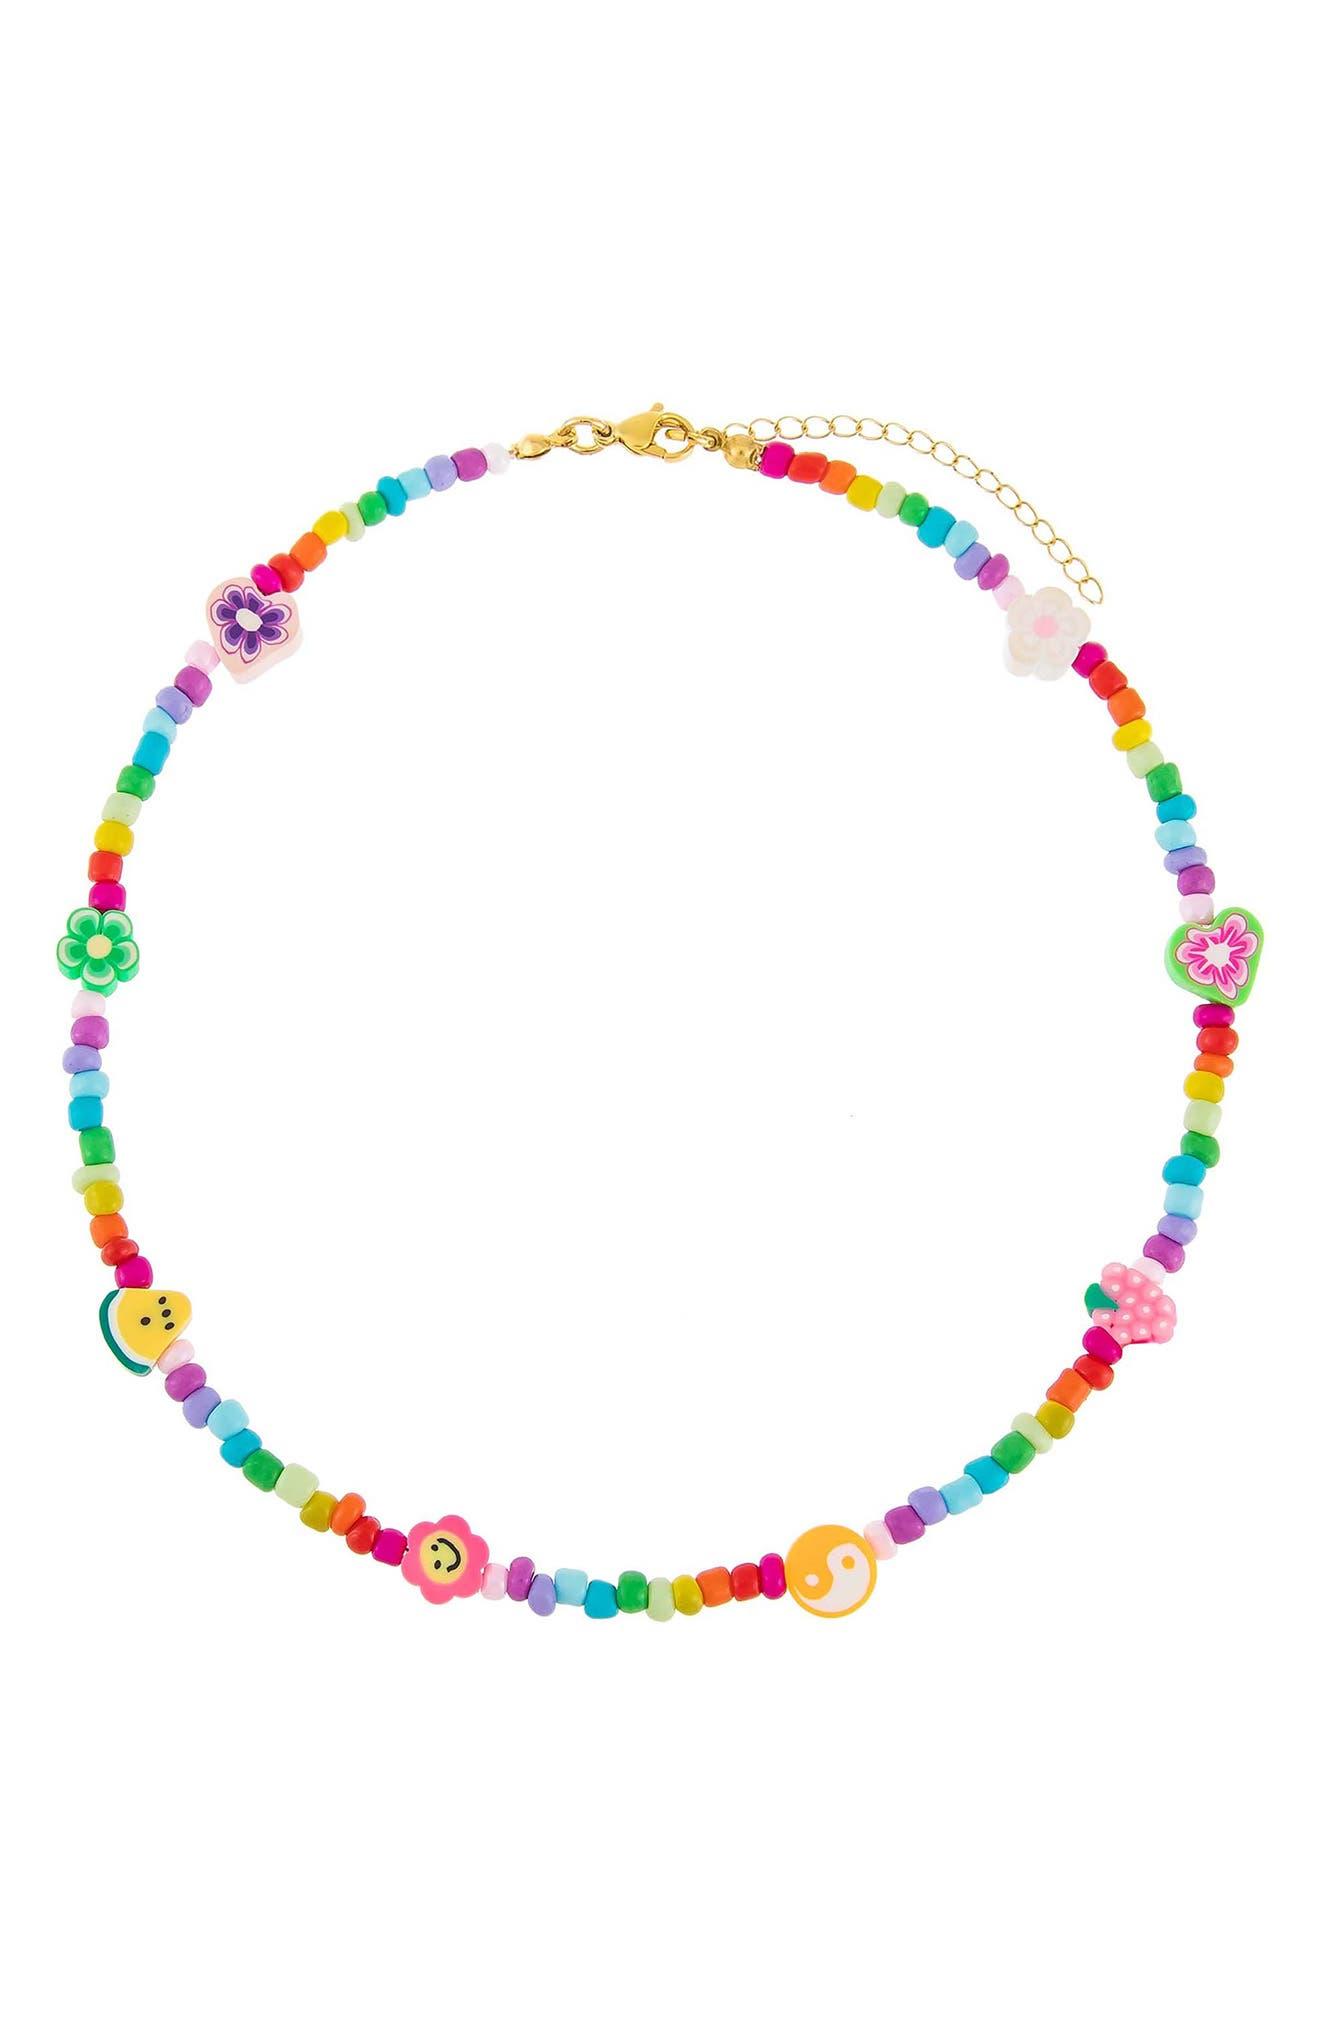 Women's Adina's Jewels Beaded Necklace